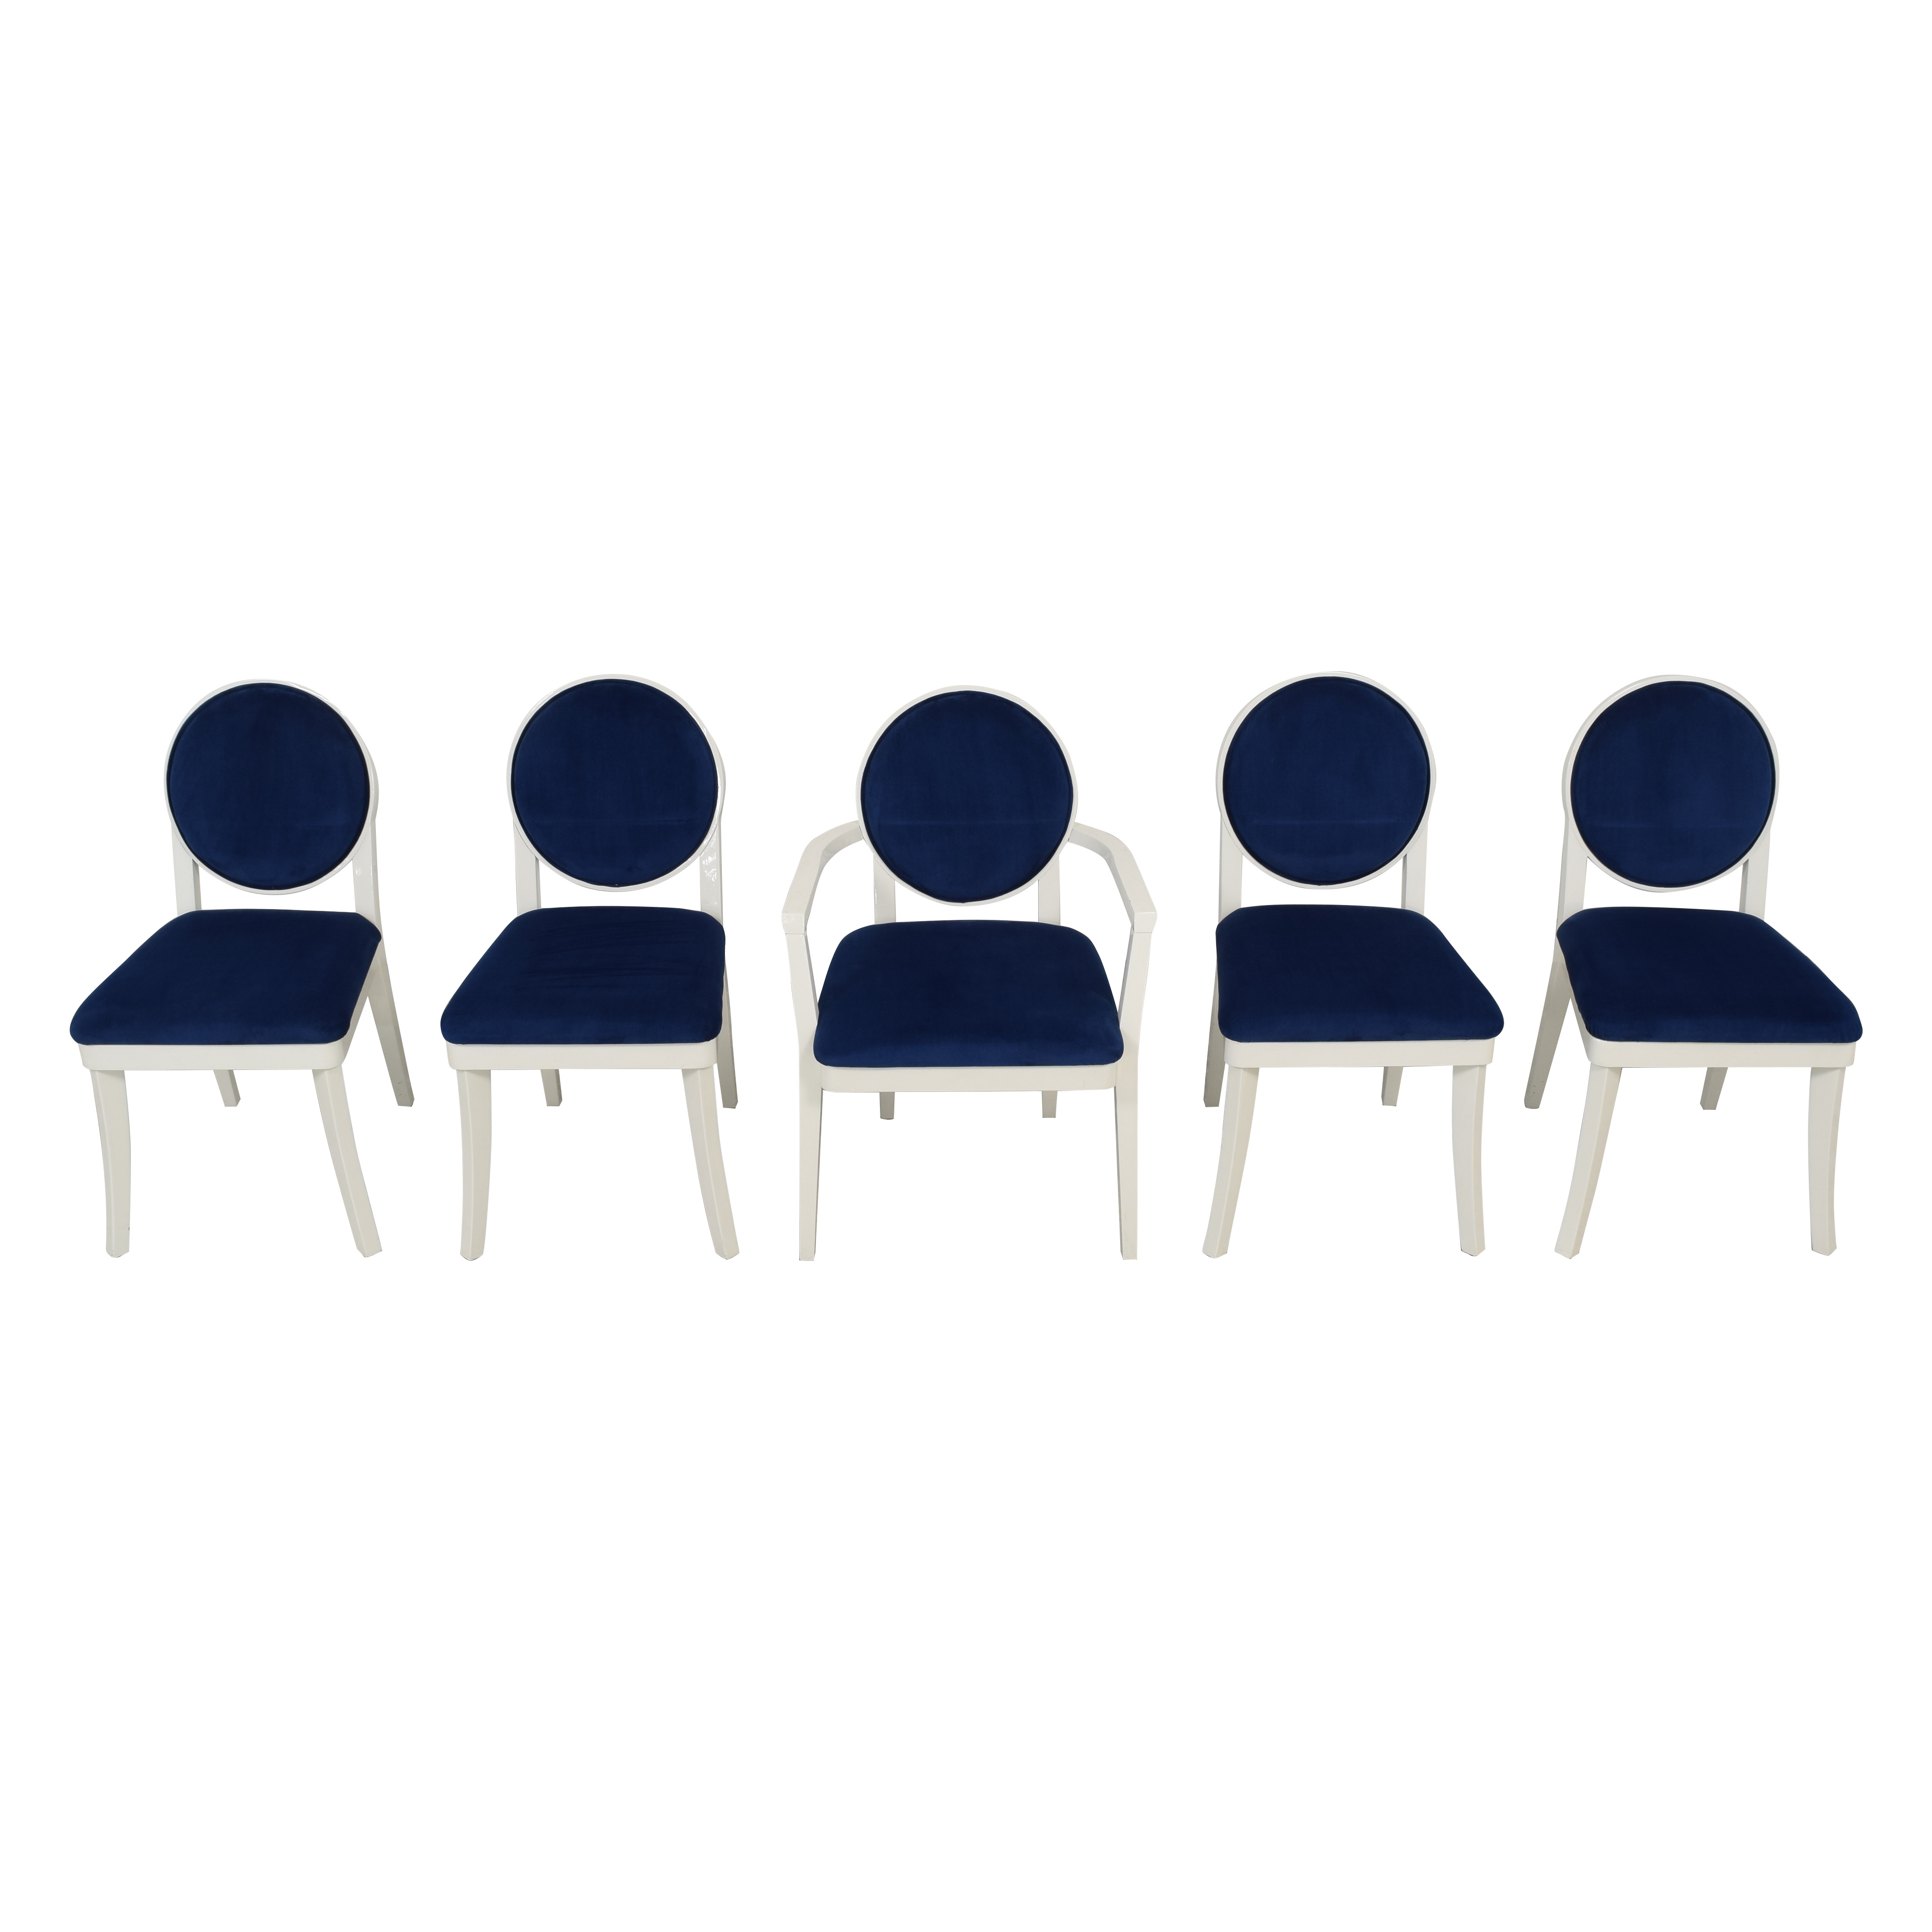 Jonathan Adler Jonathan Adler Happy Chic Dining Chairs discount